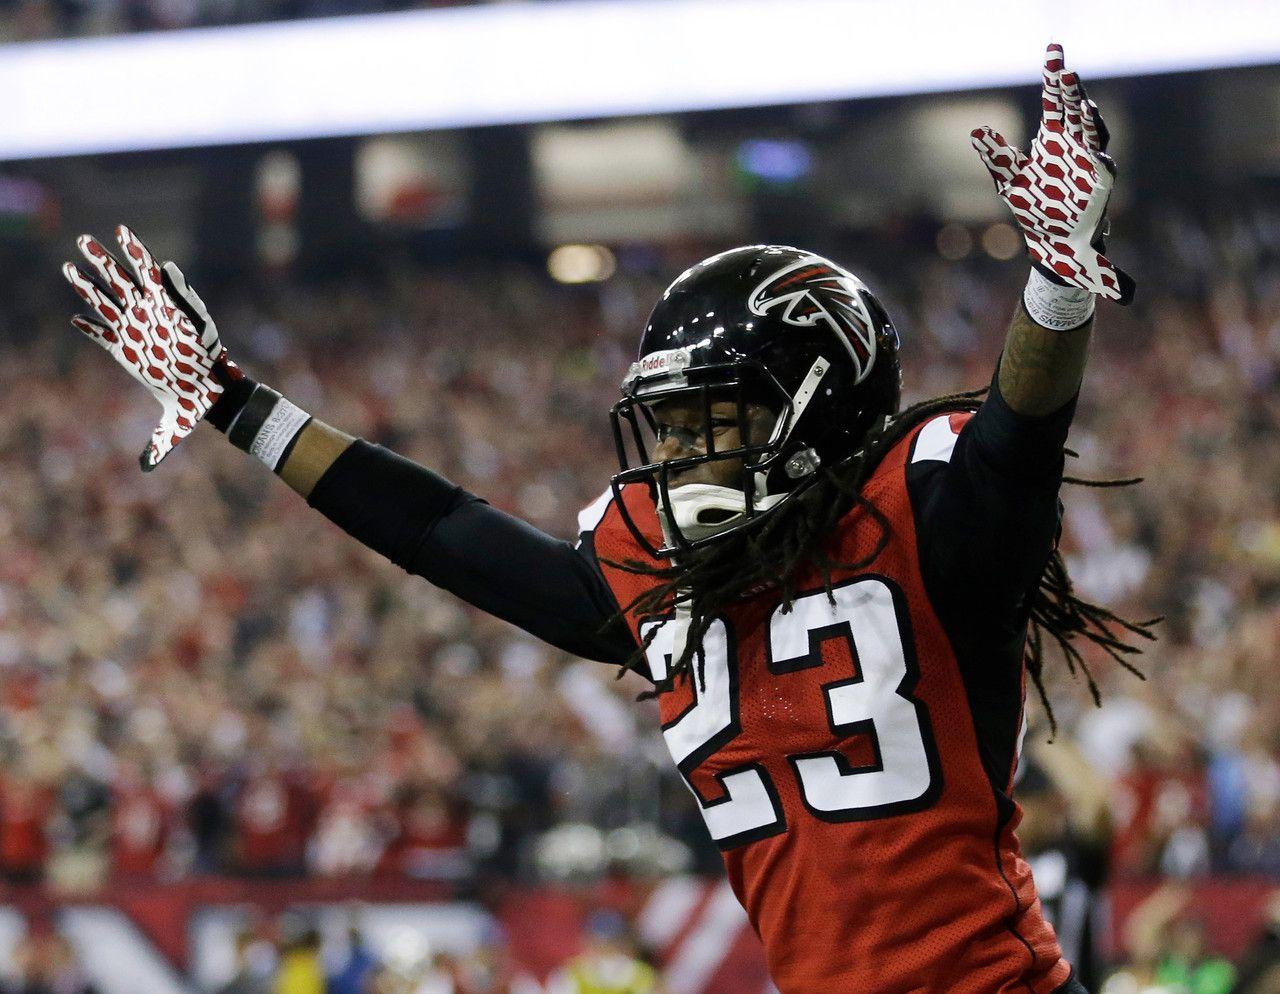 Atlanta Falcons Dunta Robinson Celebrates After Stripping The Ball From San Francisco 49ers Michael Crabtree Football Nfc Championship Game Football Helmets